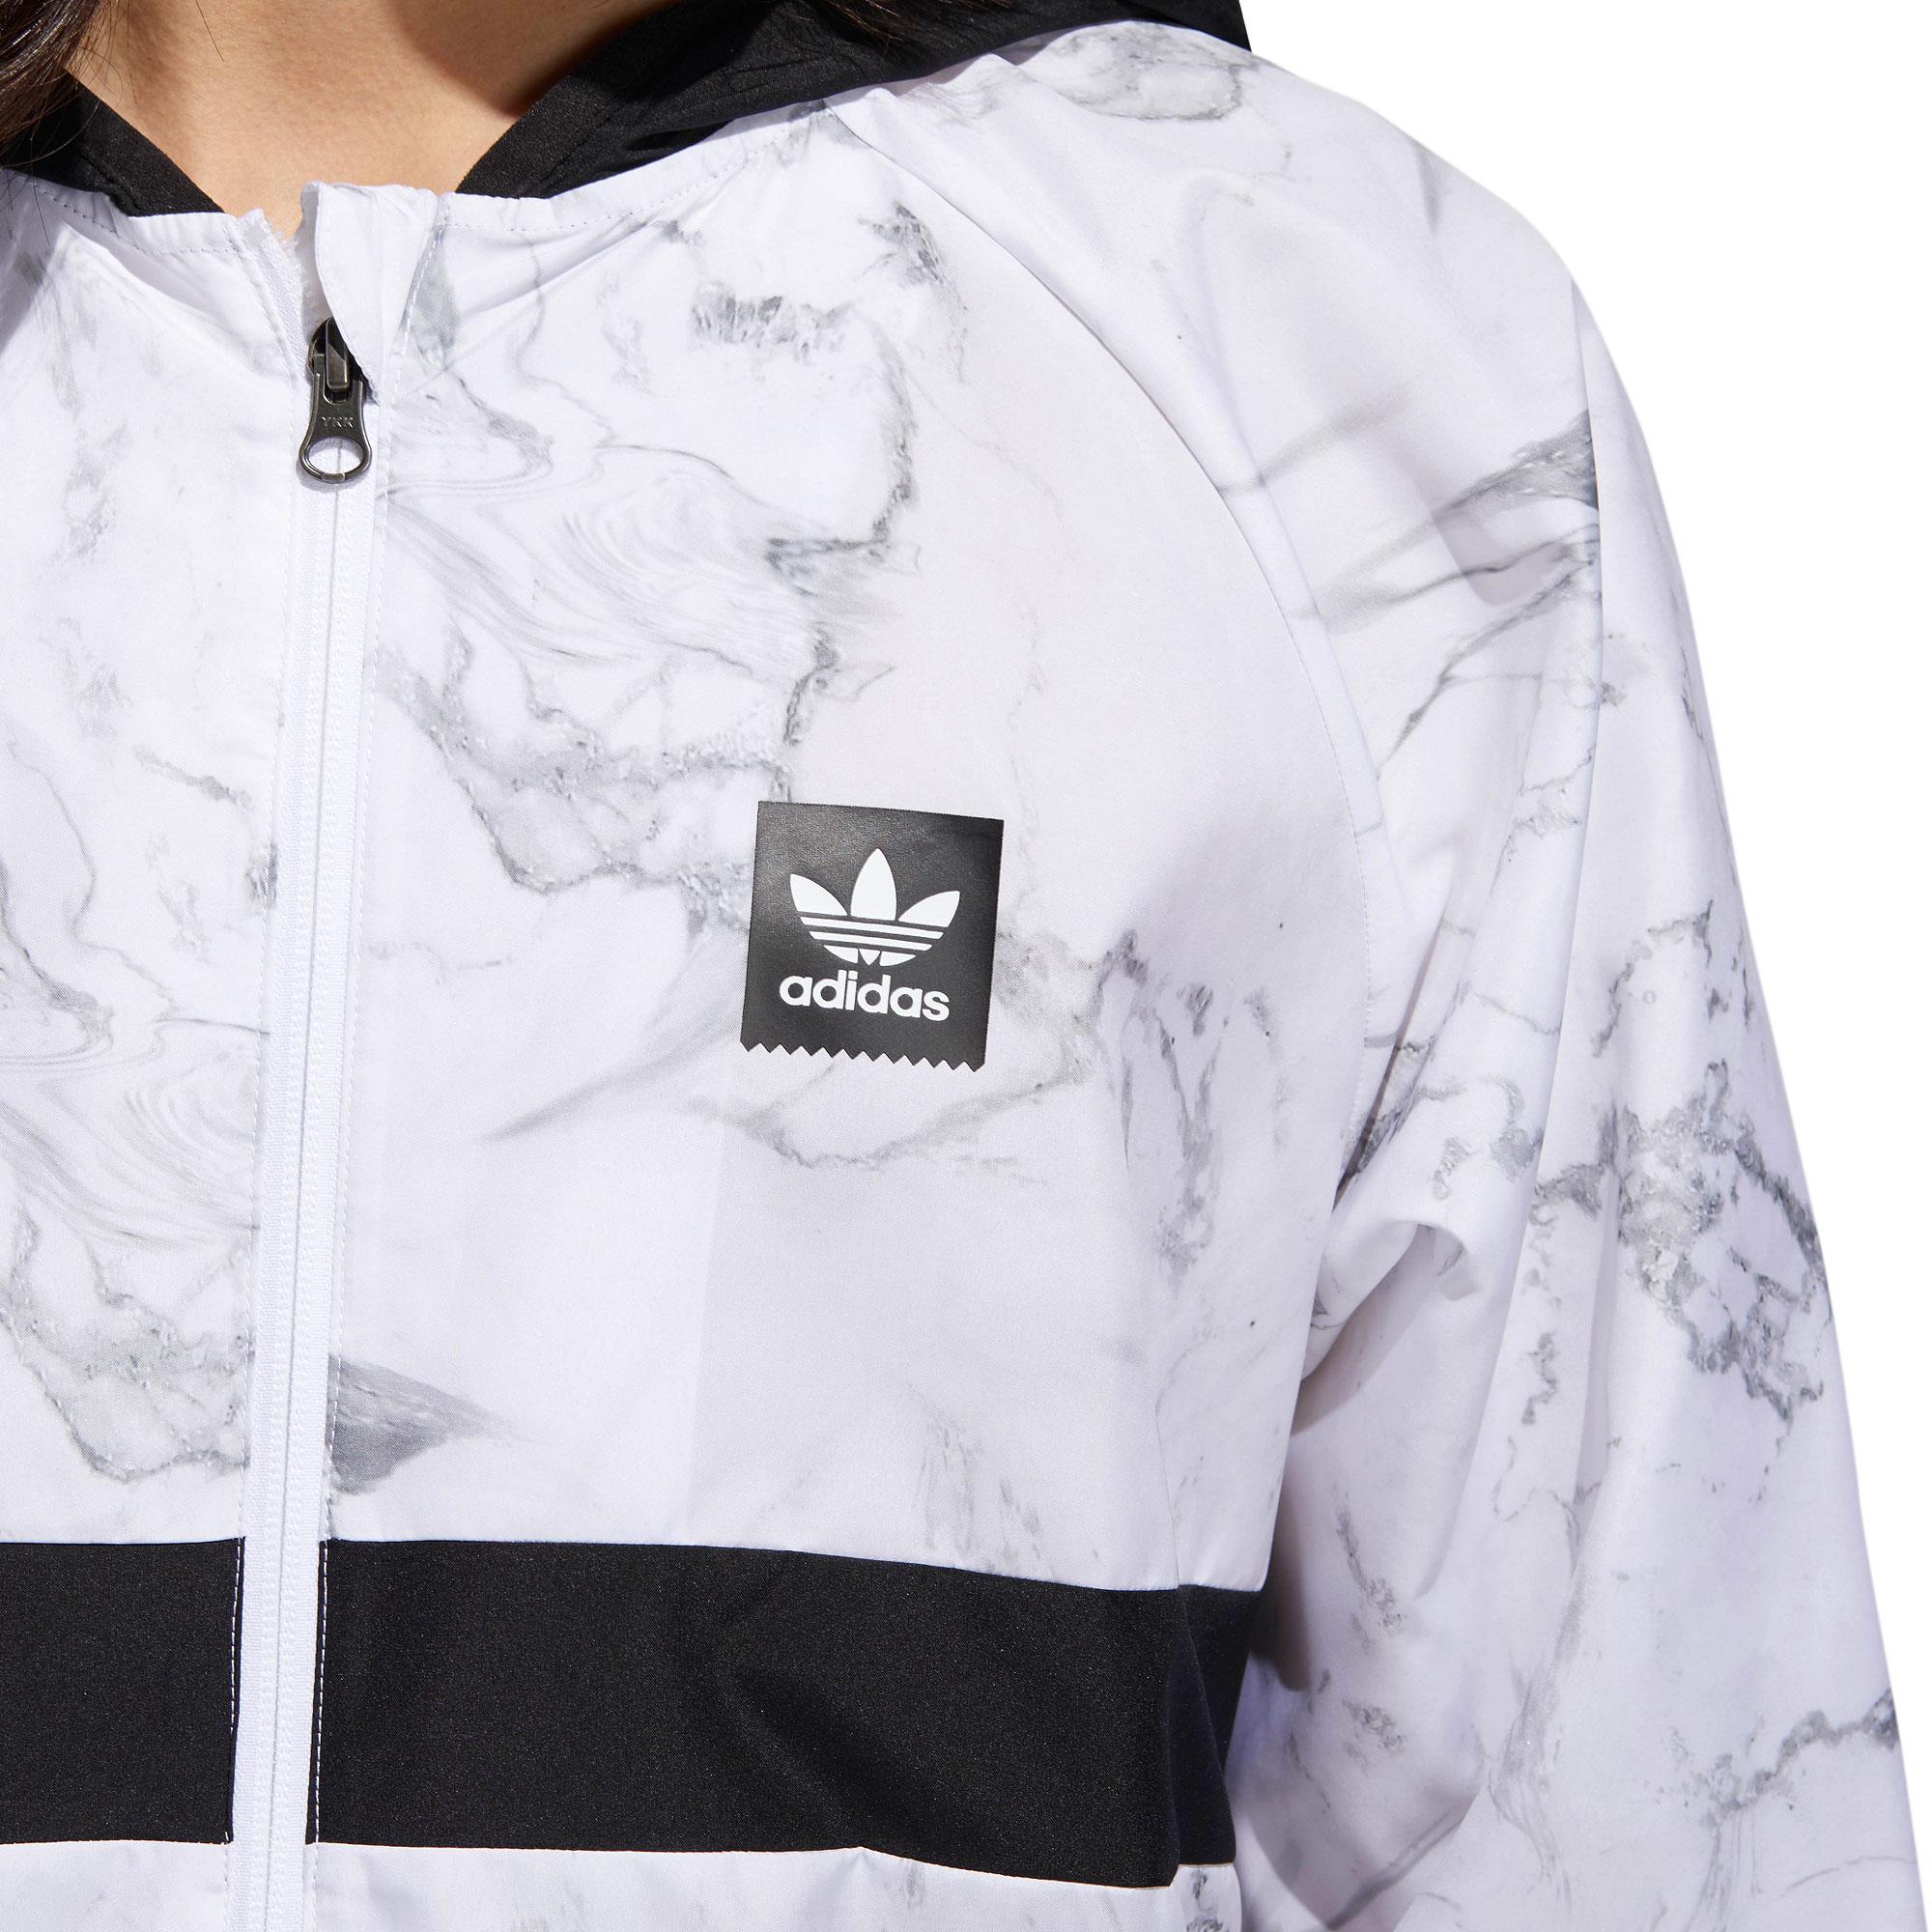 Adidas marble packable wind jacket - 2018